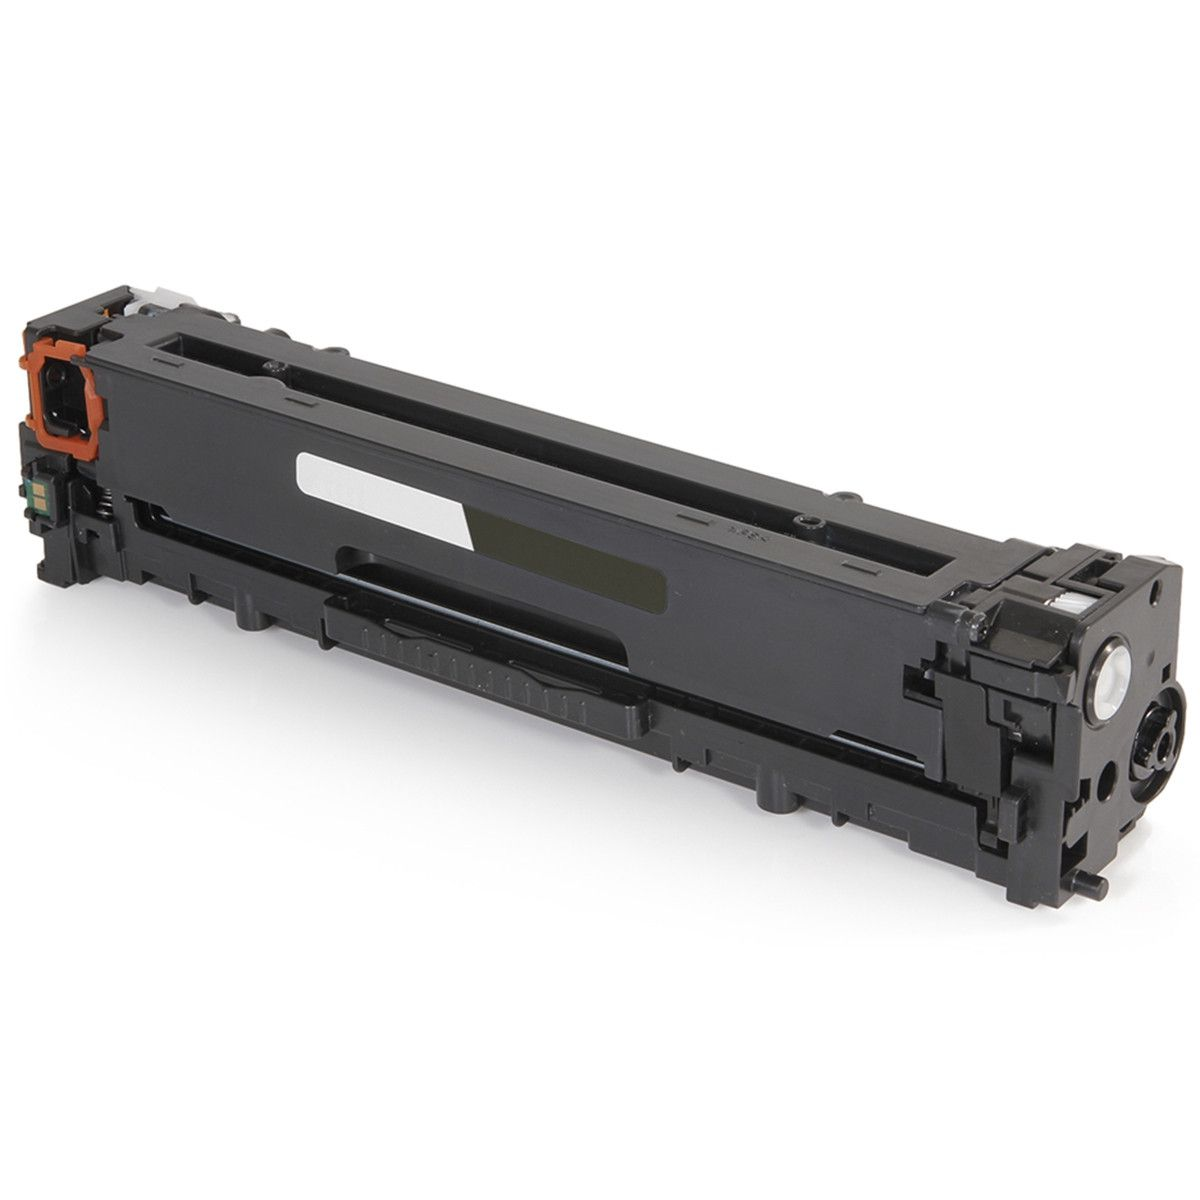 Toner Compativel com HP CE320A CE320 320A 320 128A Preto - CM1415 CM1415FN CM1415FNW CP1525 CP1525NW - 2,1K